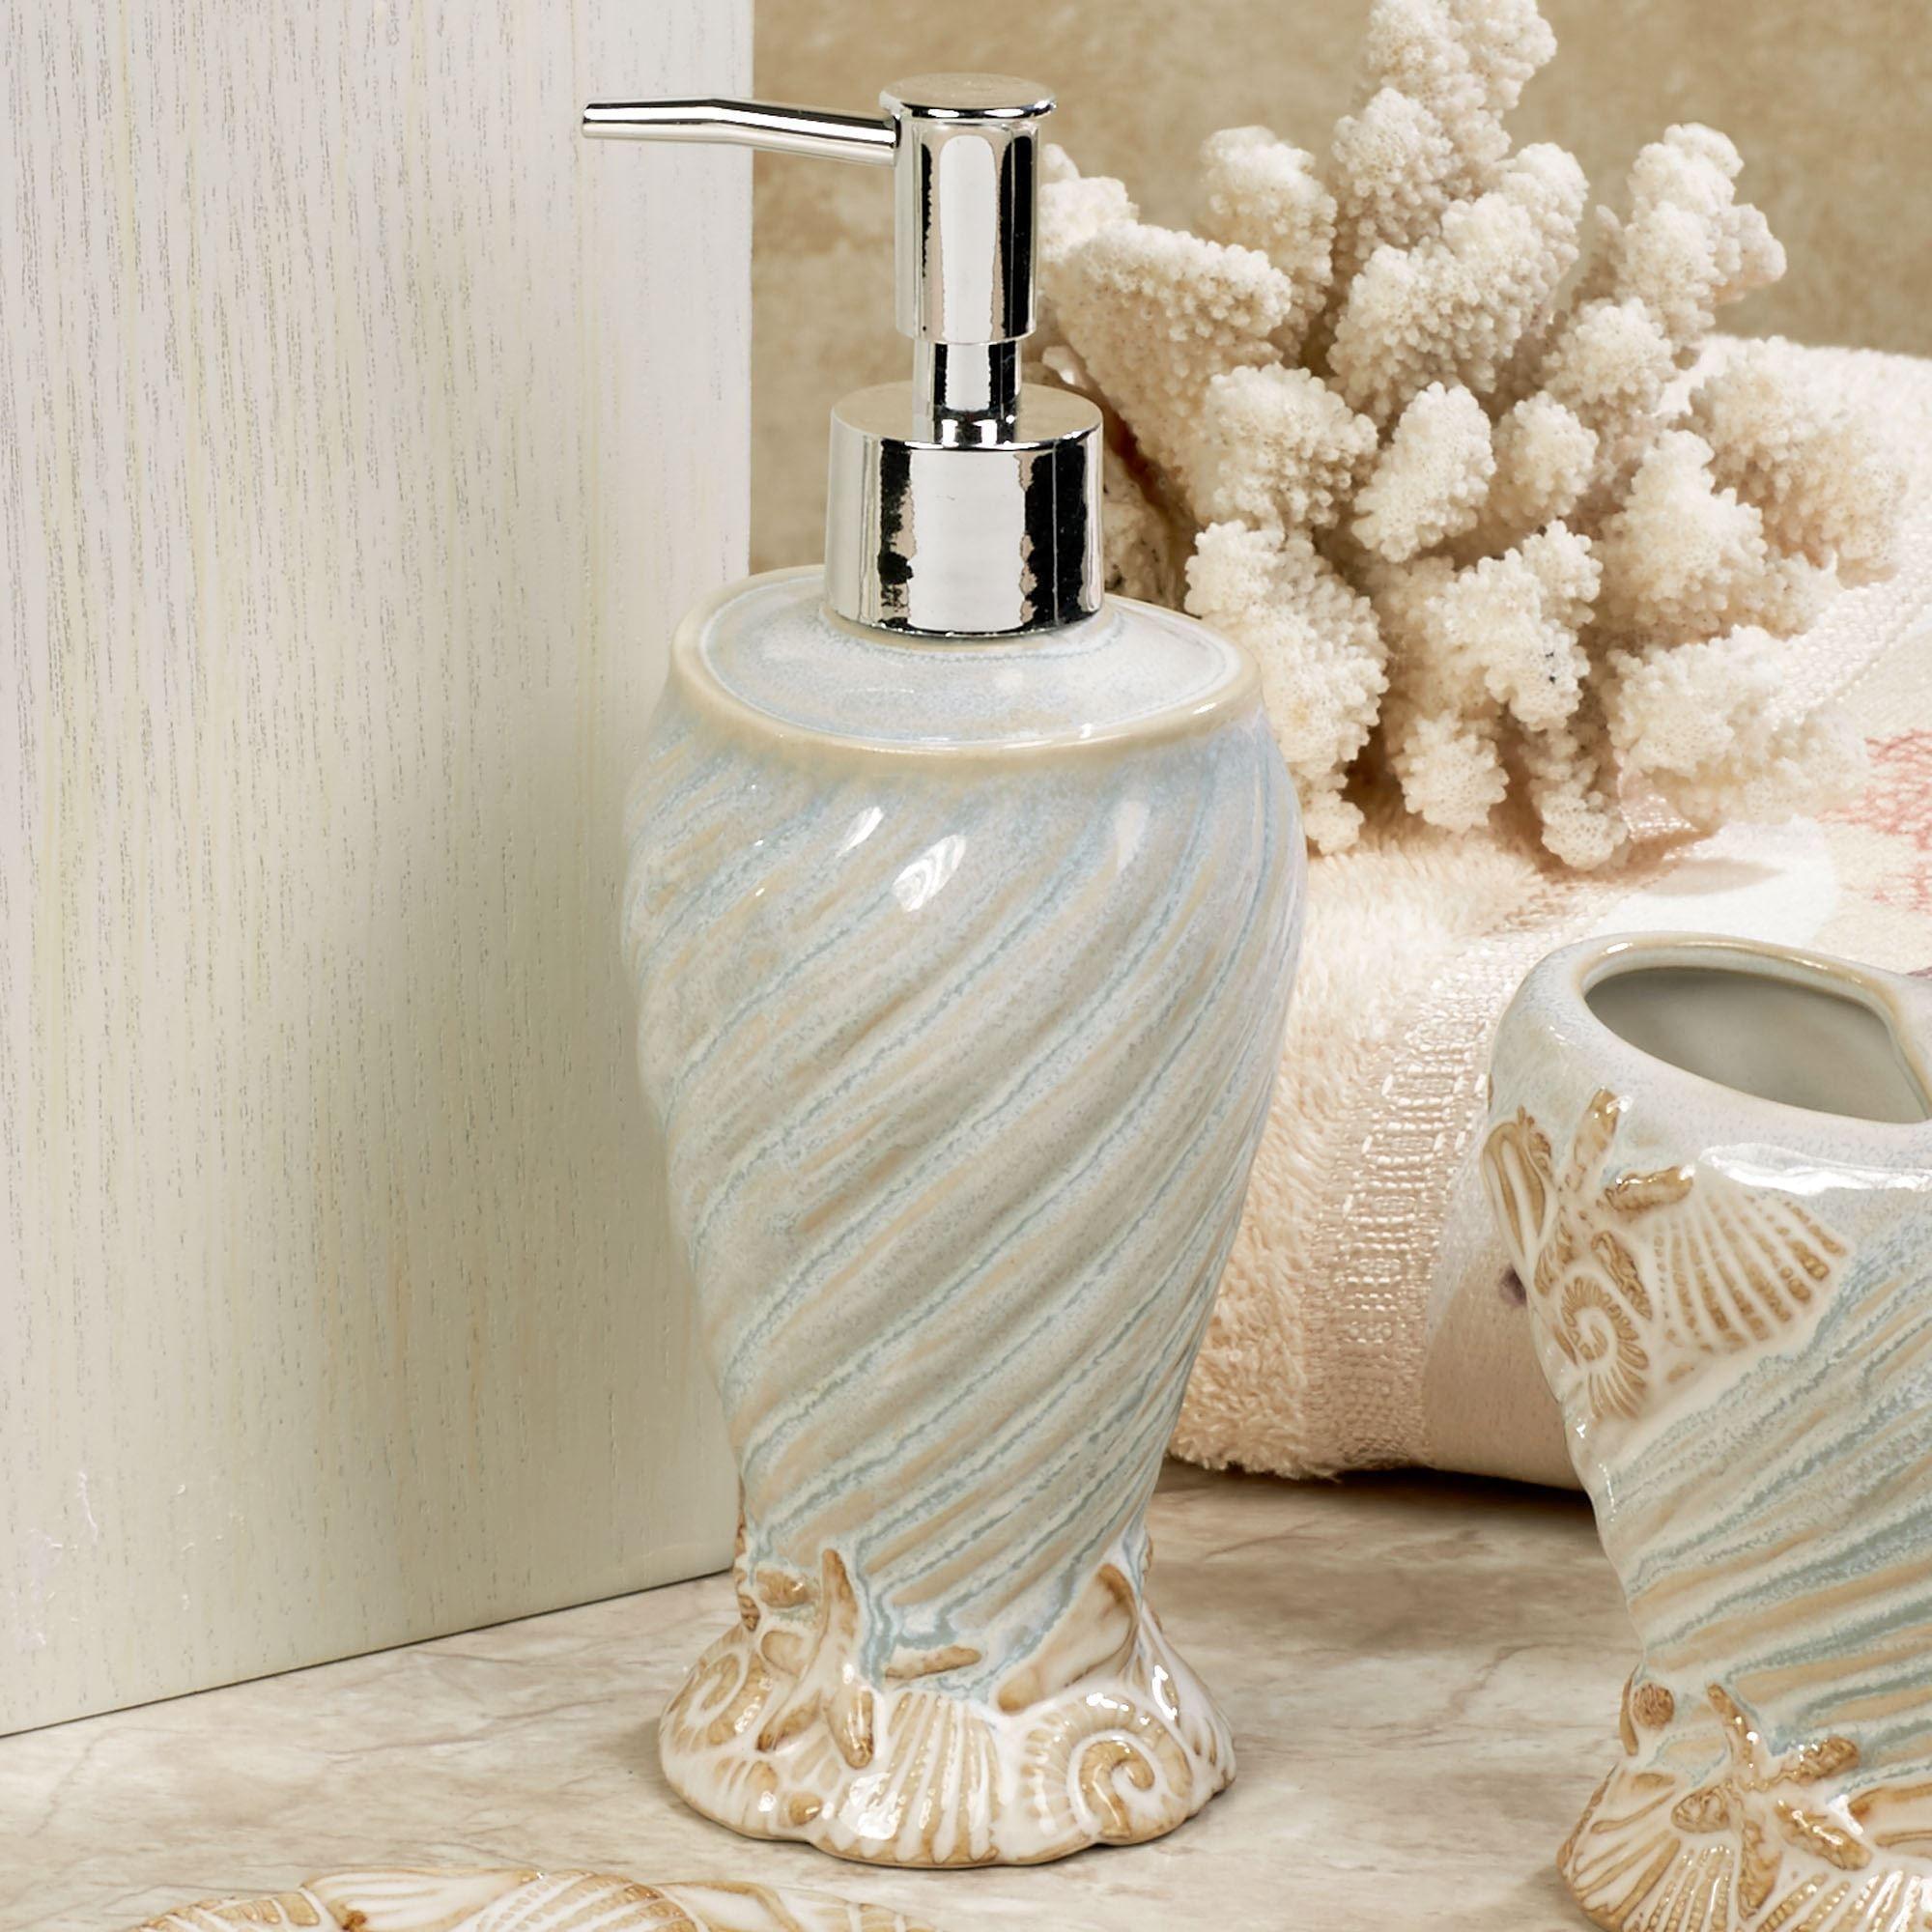 Croscill Bathroom Accessories - 4k Wallpapers Design